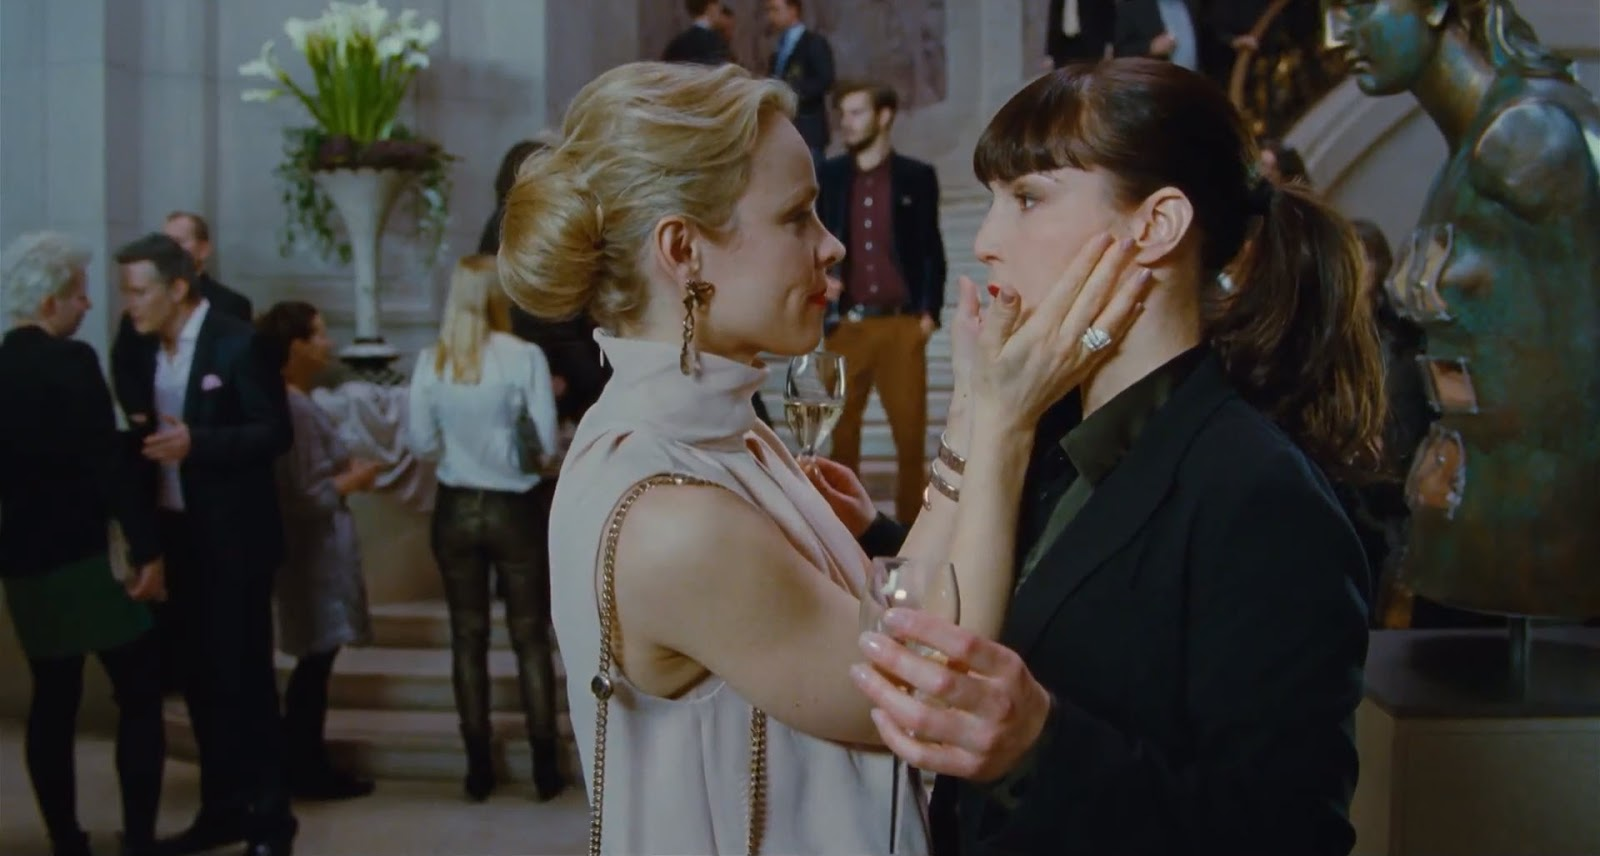 http://4.bp.blogspot.com/-2ZaNuhistWA/UHSh2Jkd9WI/AAAAAAABguo/gi7Uaqp-yrM/s1600/rachel-mcadams-strokes-noomi-rapace-for-passion-movie.jpg